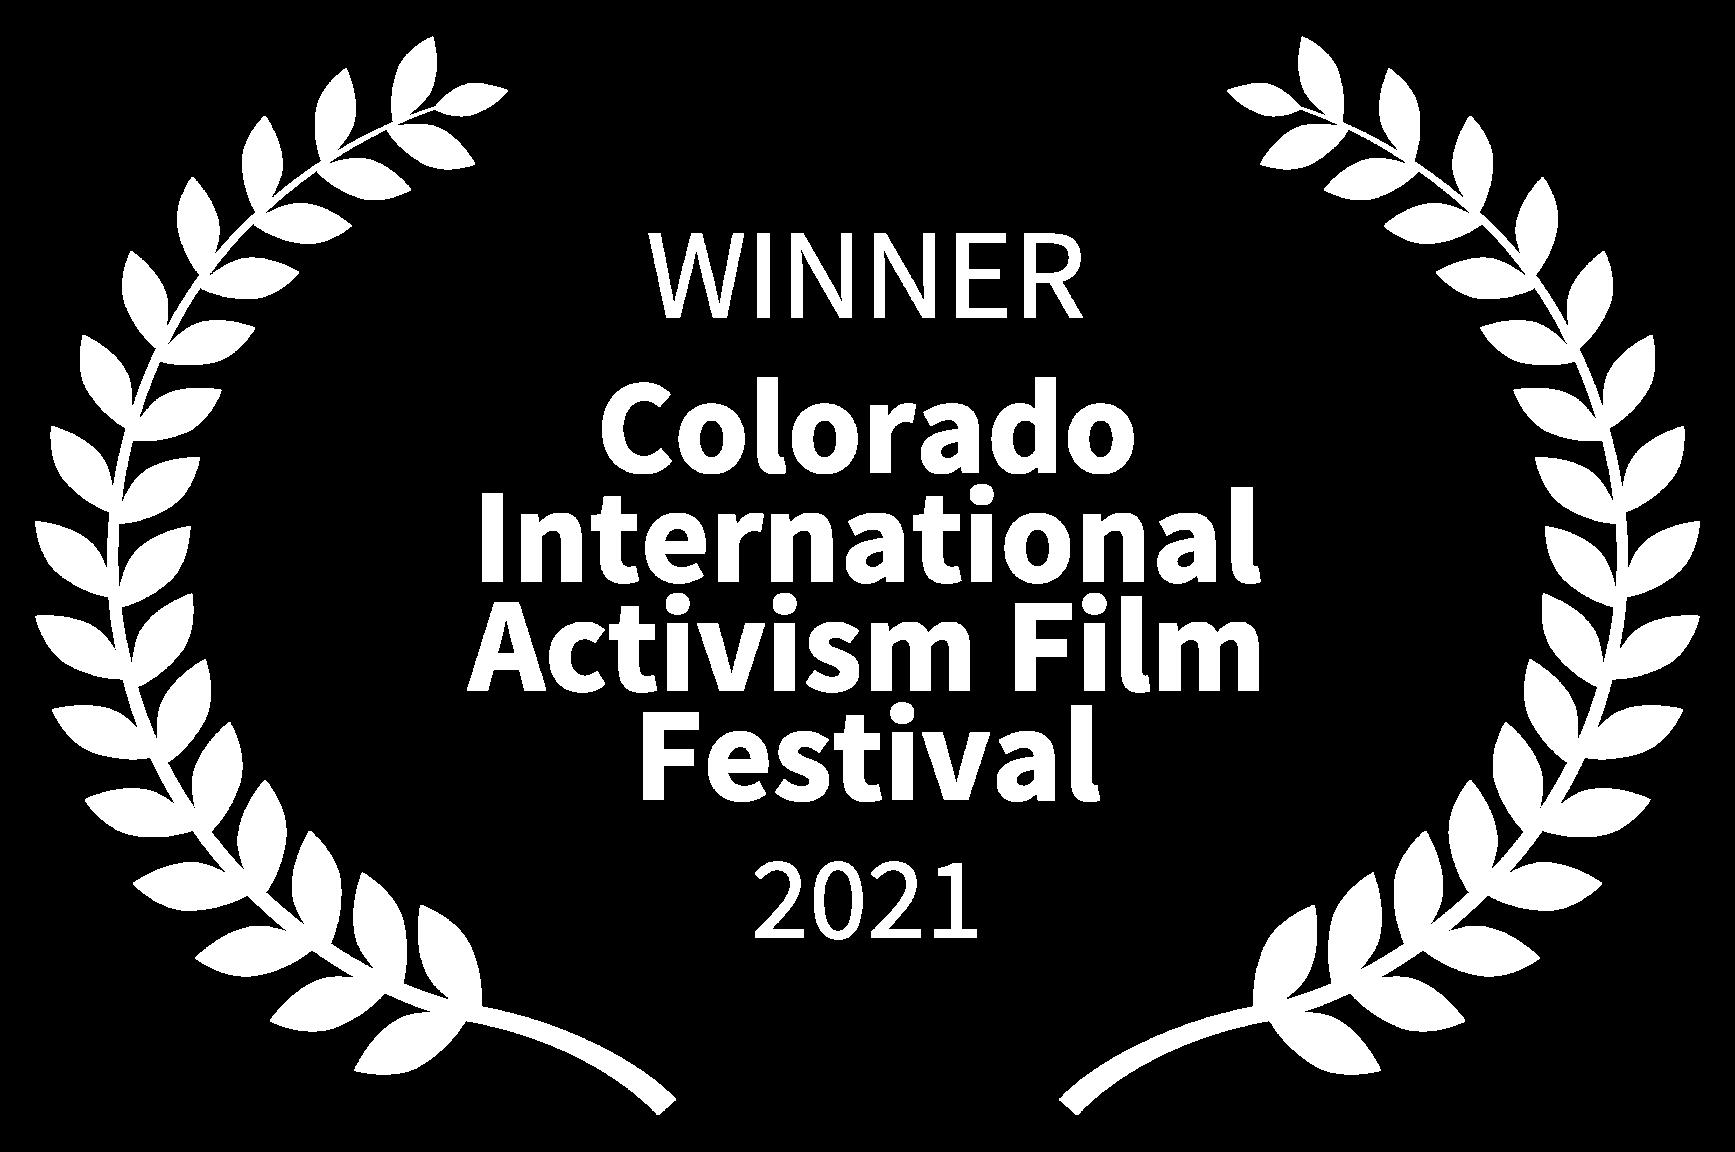 Colorado International